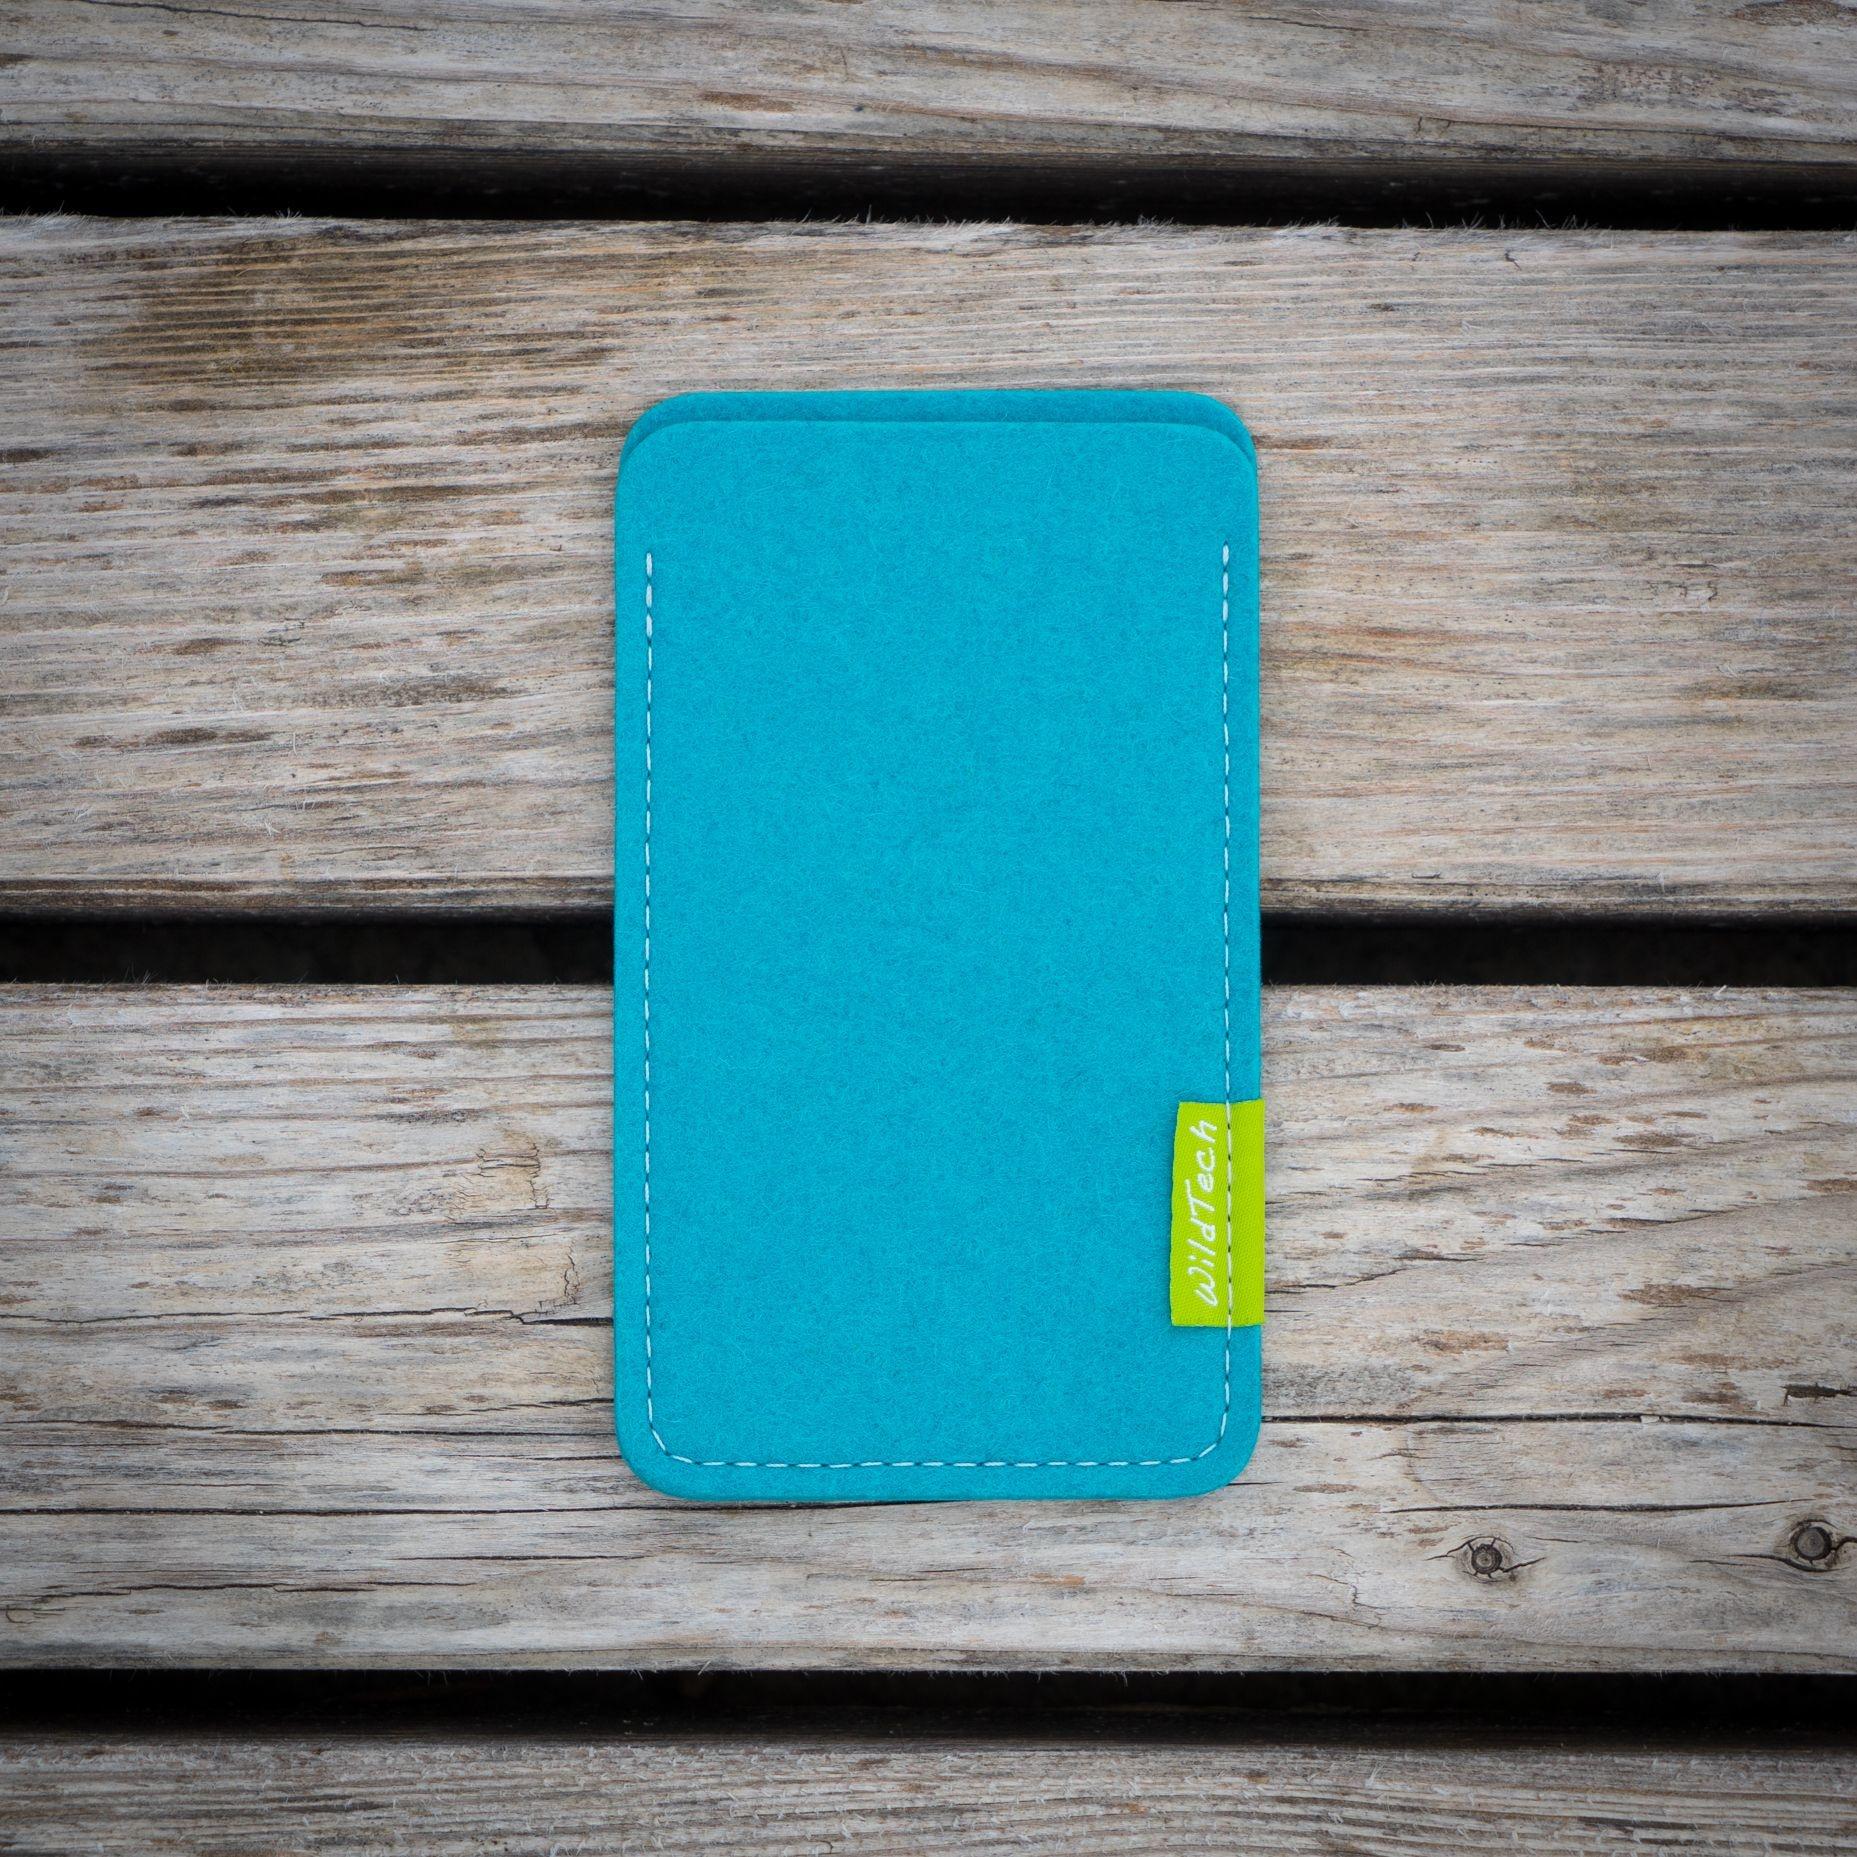 Galaxy Sleeve Turquoise-2